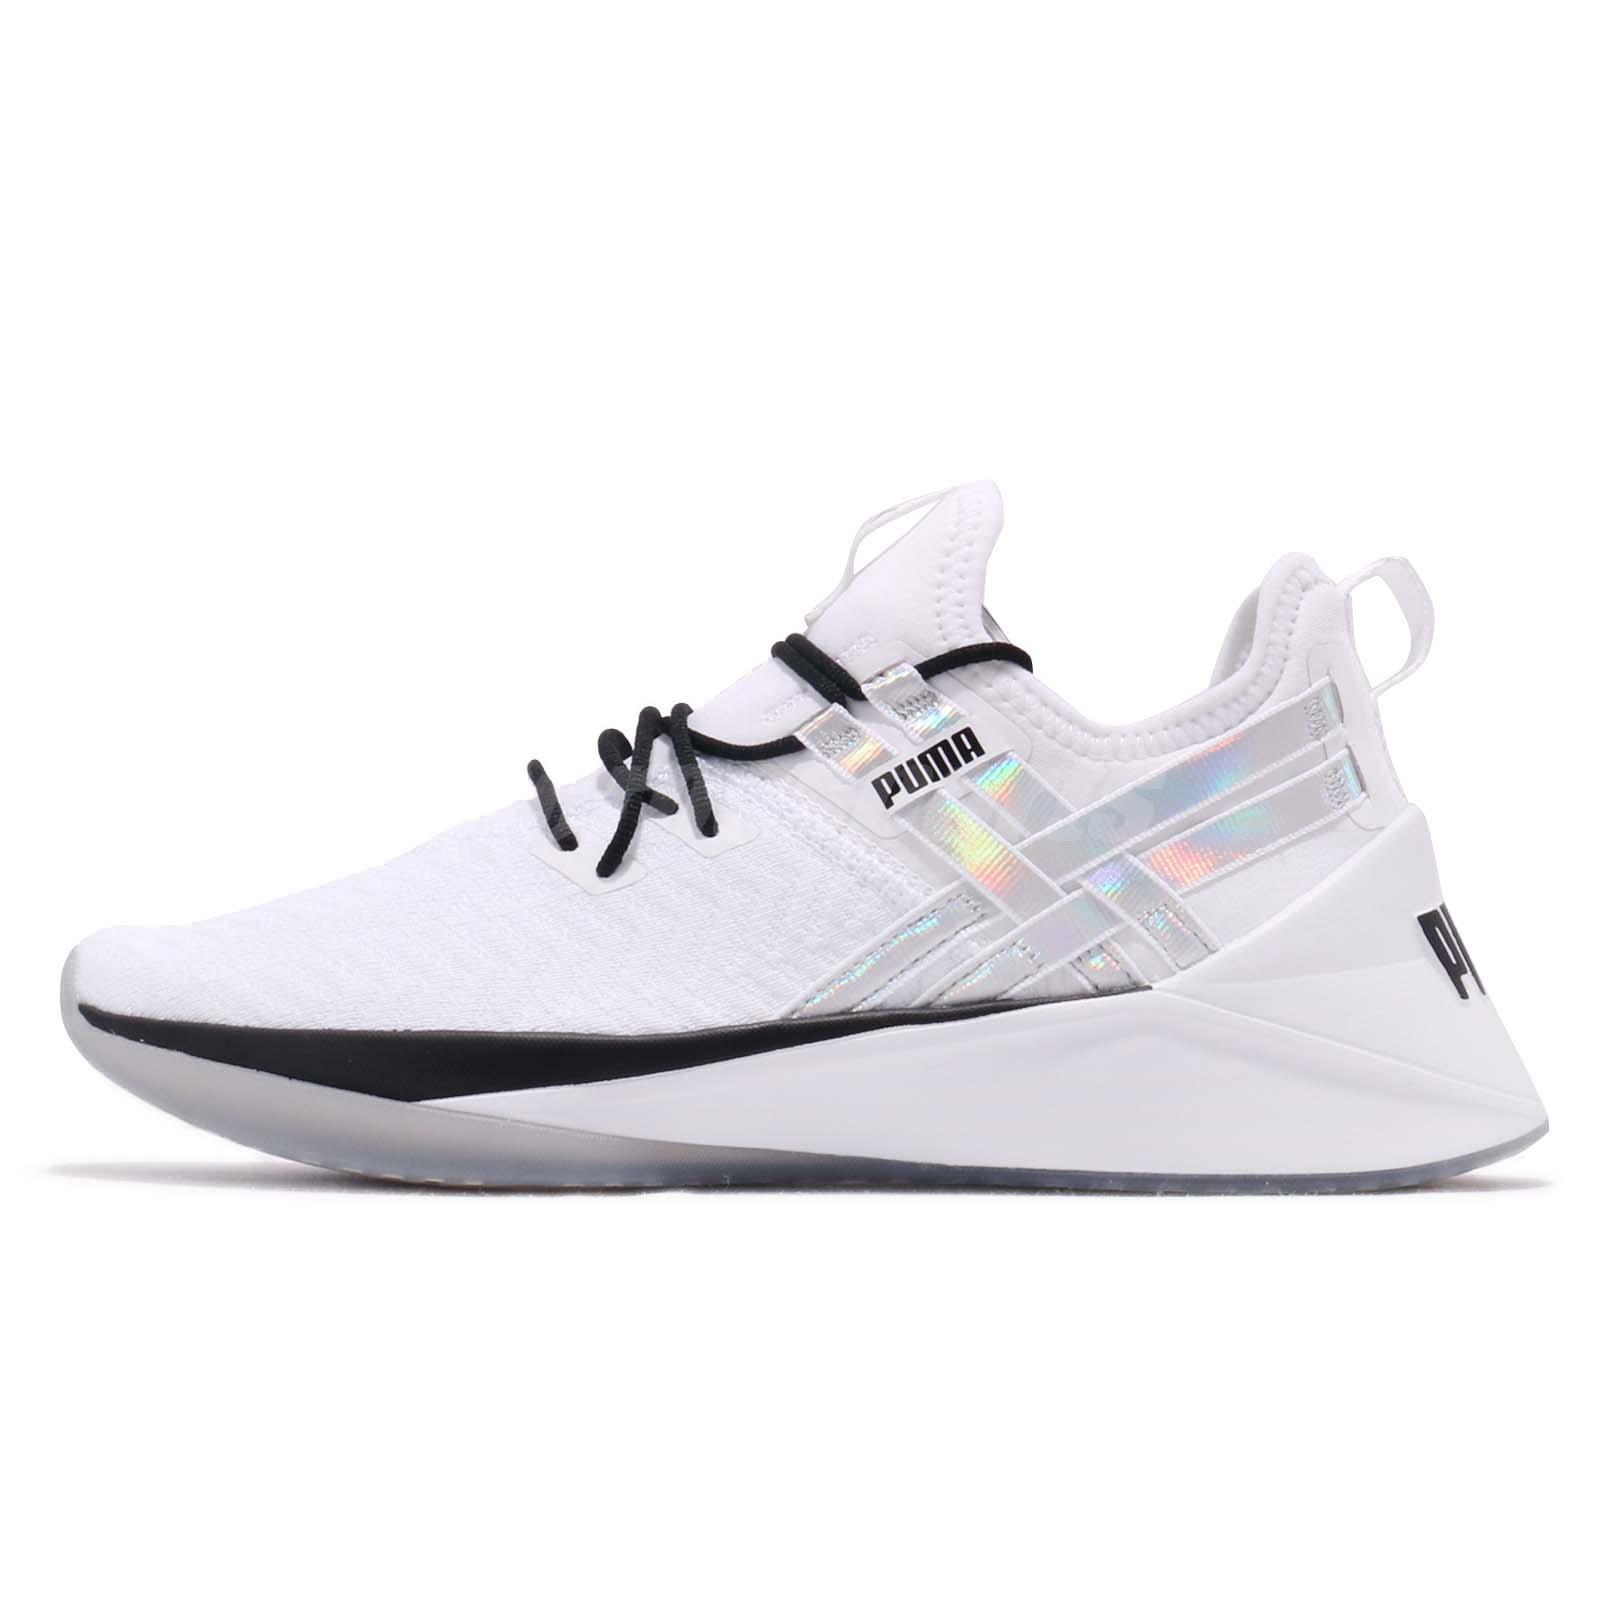 639a166d8f Puma Jaab XT Iridescent TZ Wns White Black Women Cross Training Shoes  192240-02